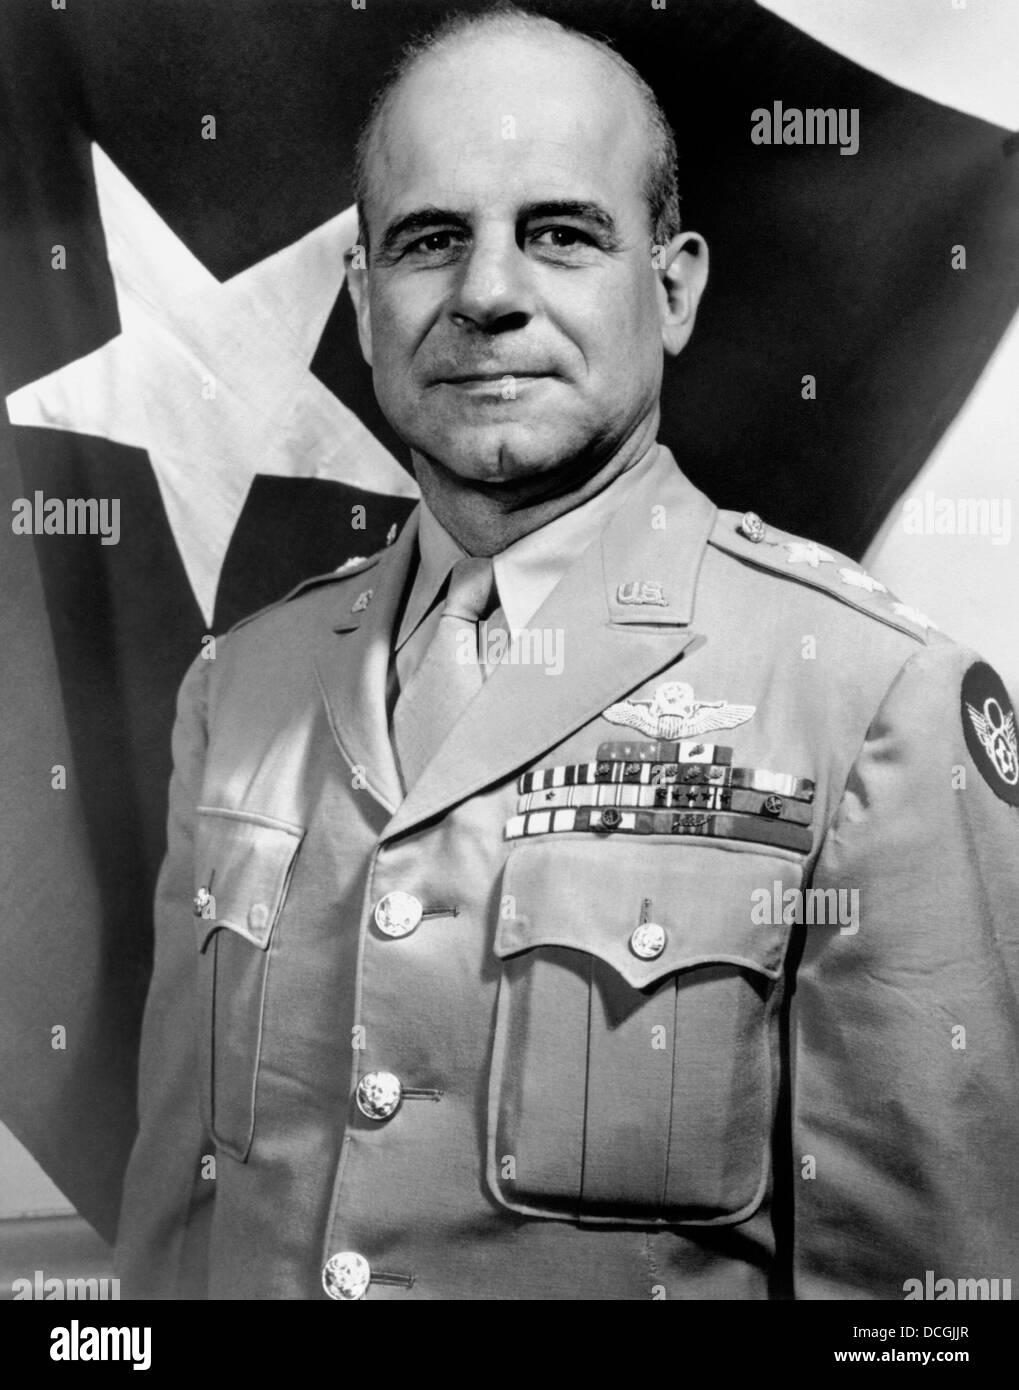 Digitally restored vintage World War II photo of General James Doolittle. - Stock Image